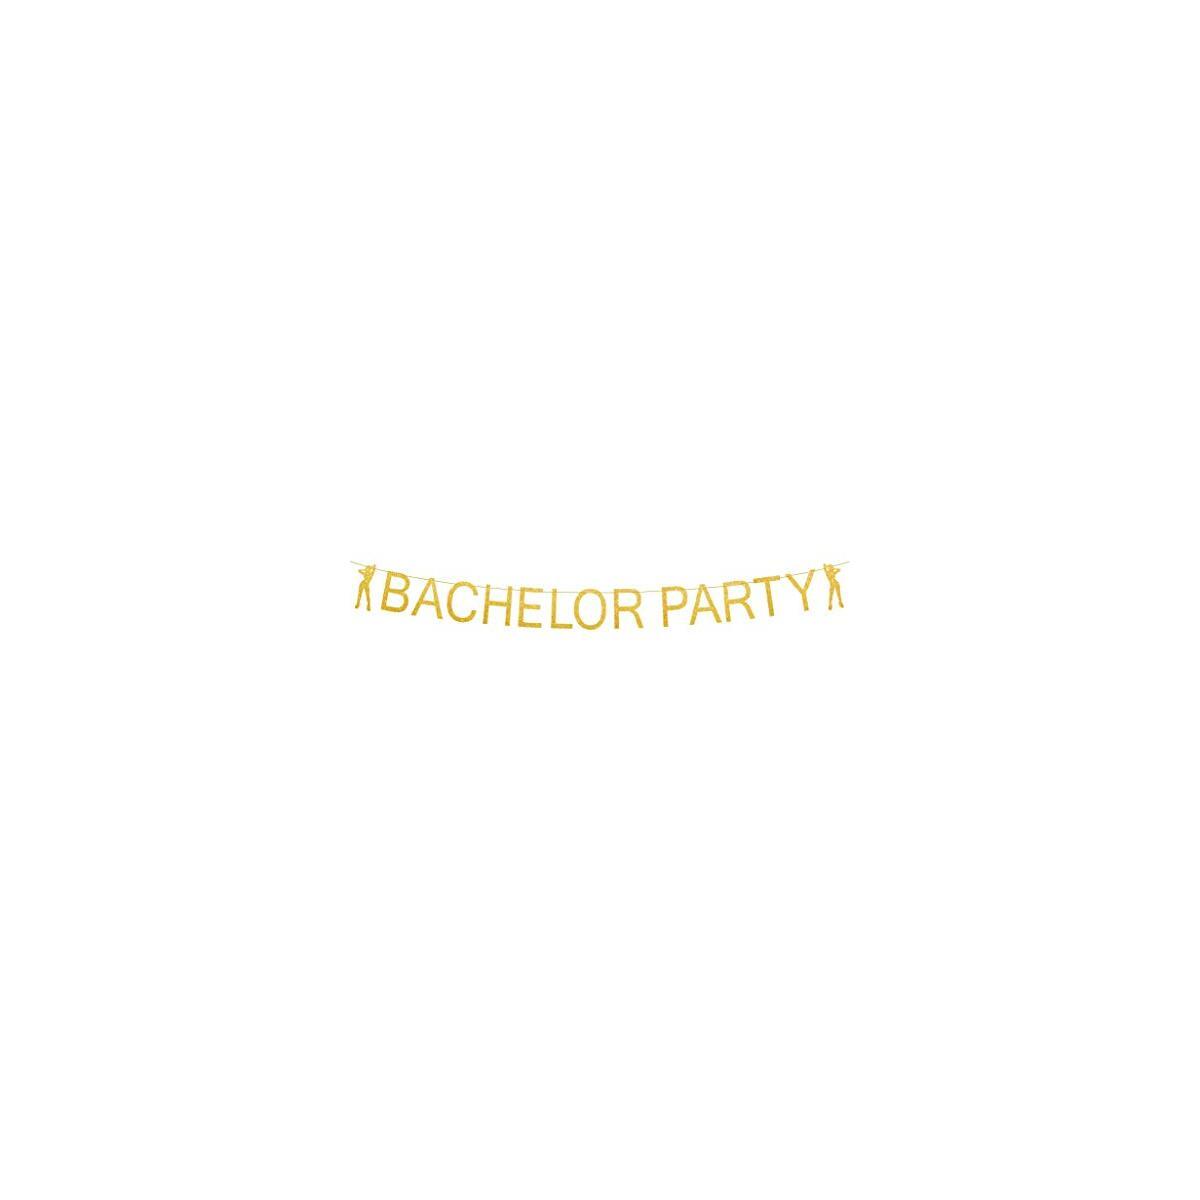 BroSash - Bachelor Party Decorations